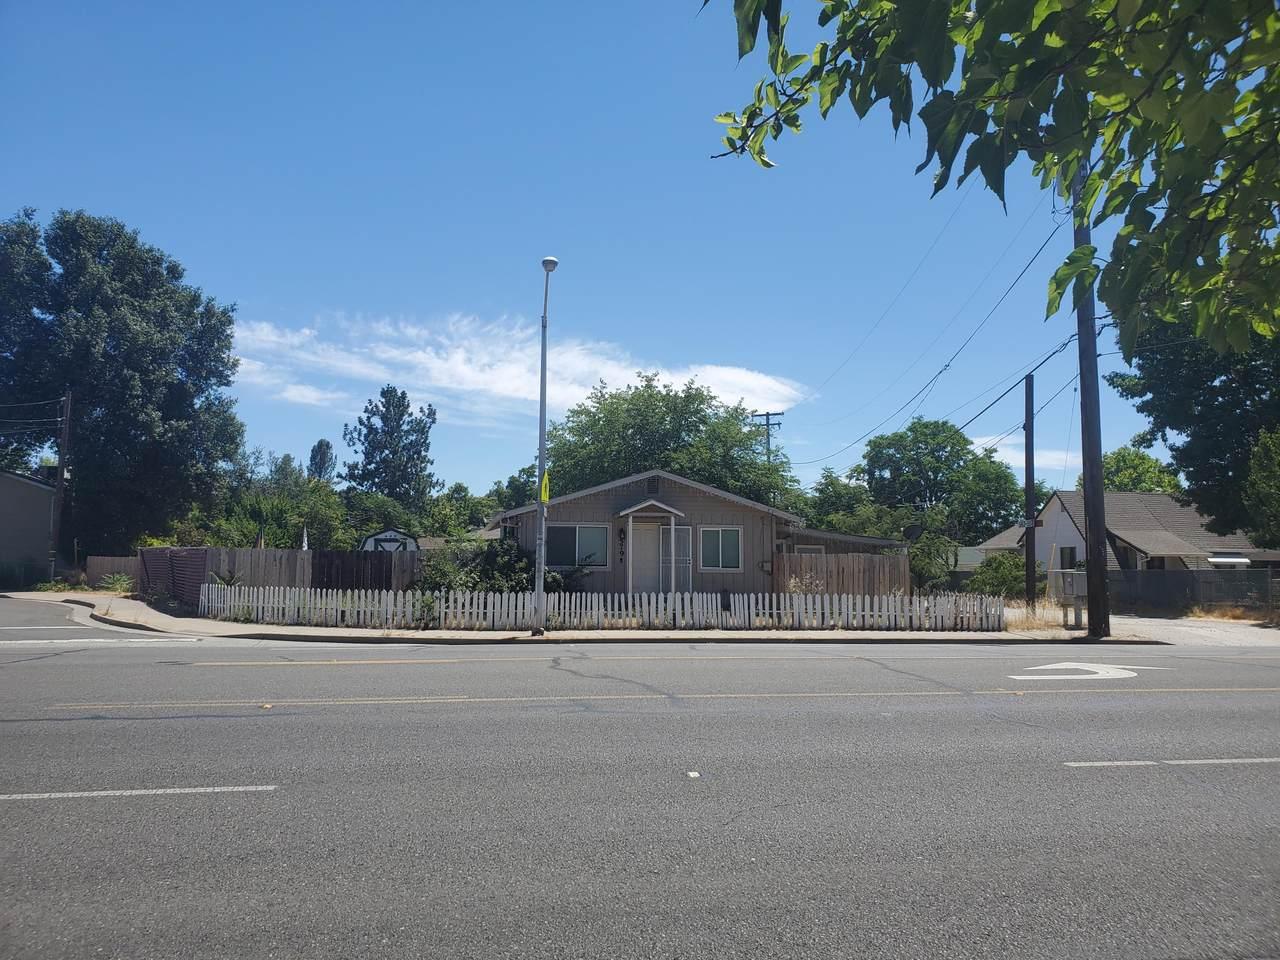 579 Hartnell Ave - Photo 1